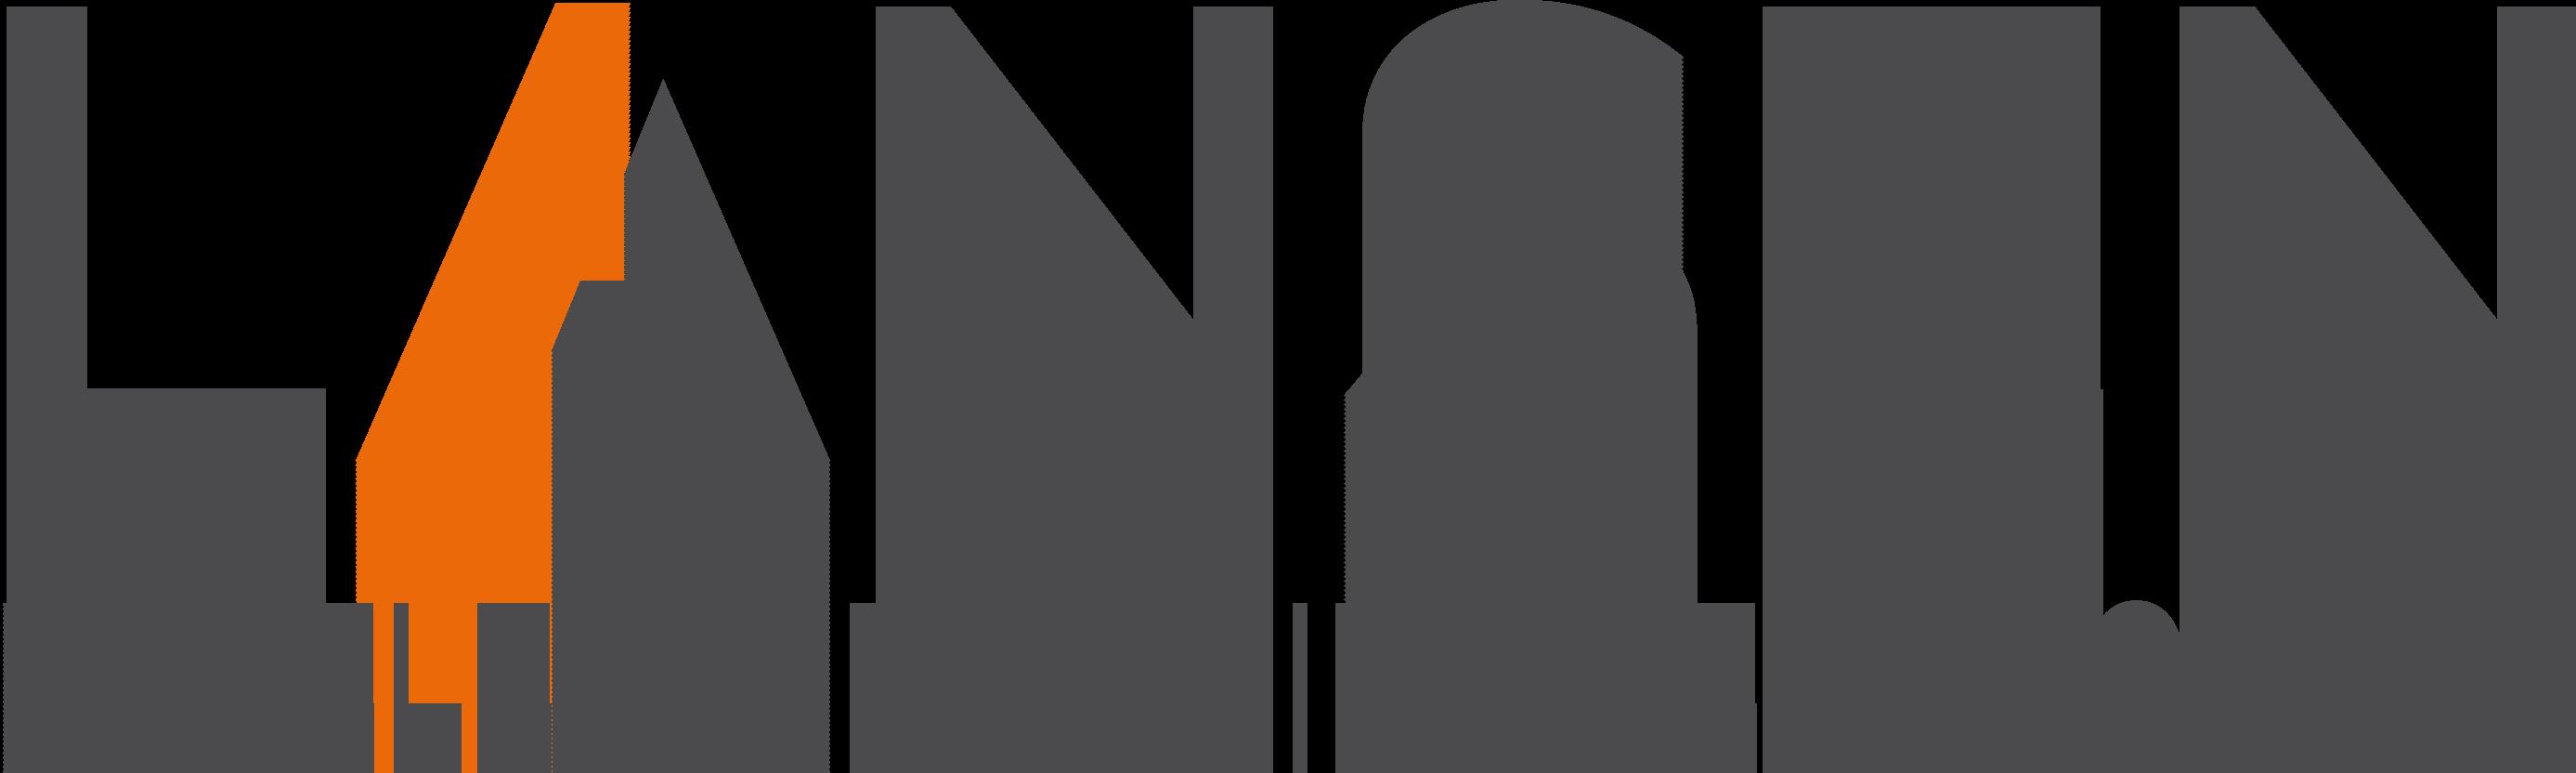 Logo Lansen mit Slogan